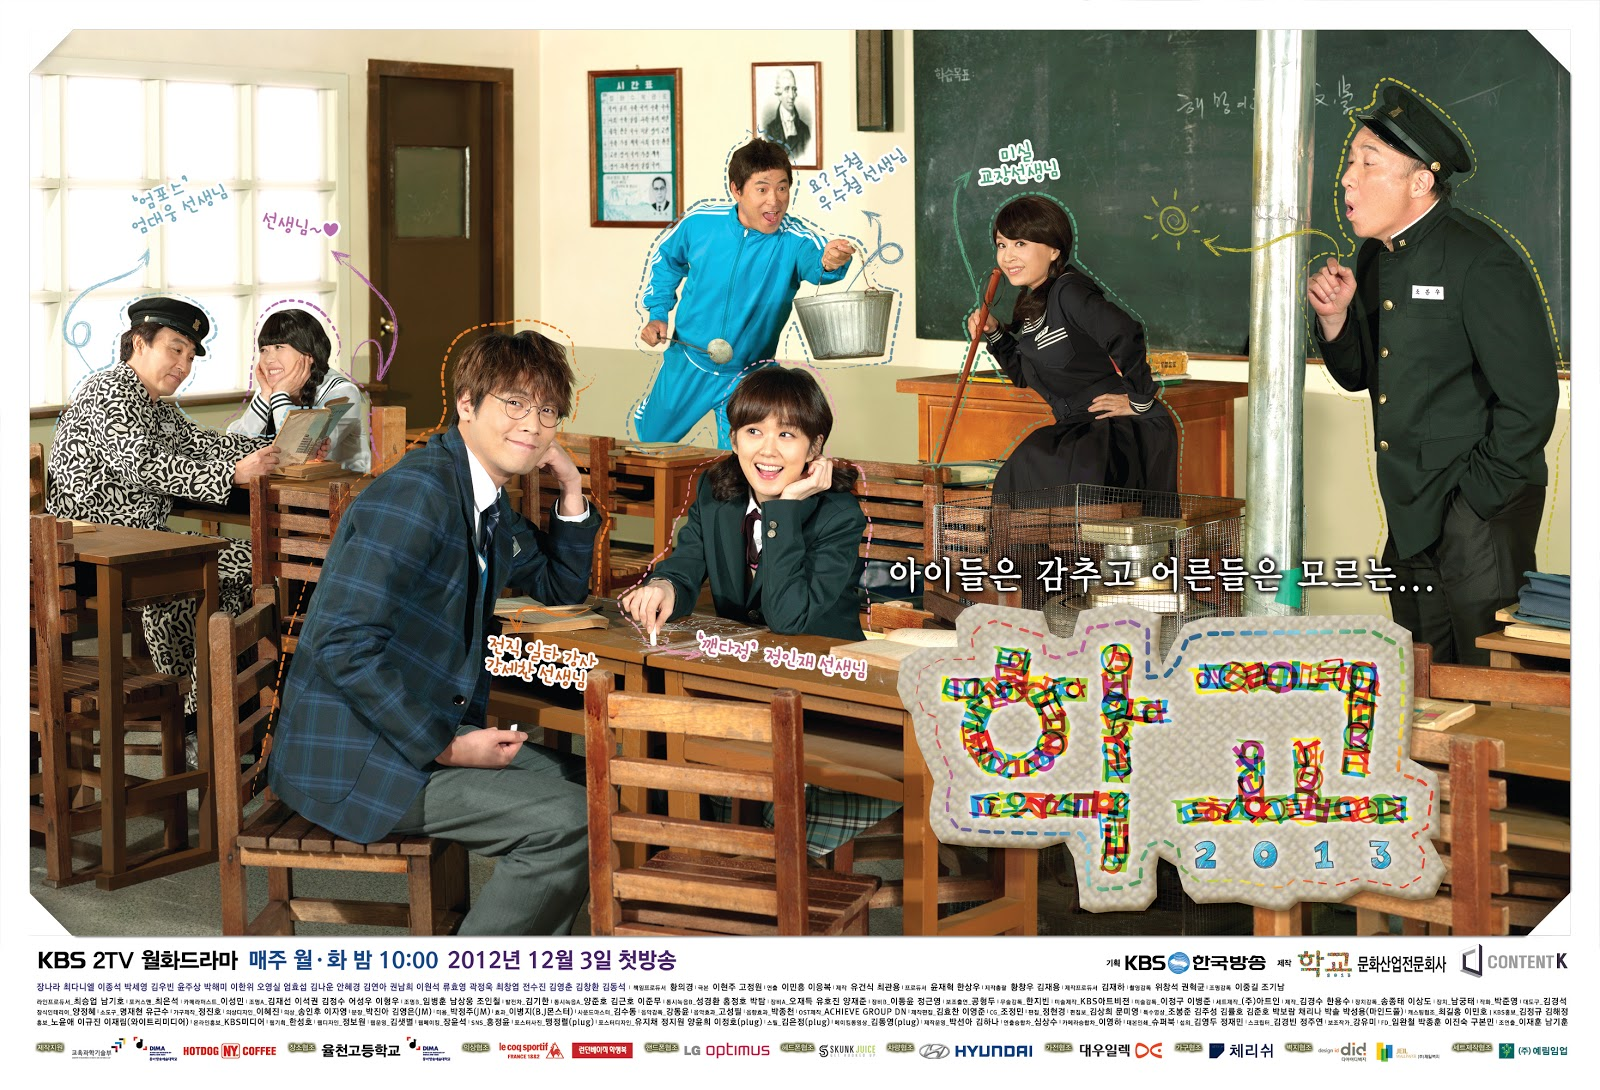 school 2013, school 2013 korean drama, school 2013 kdrama